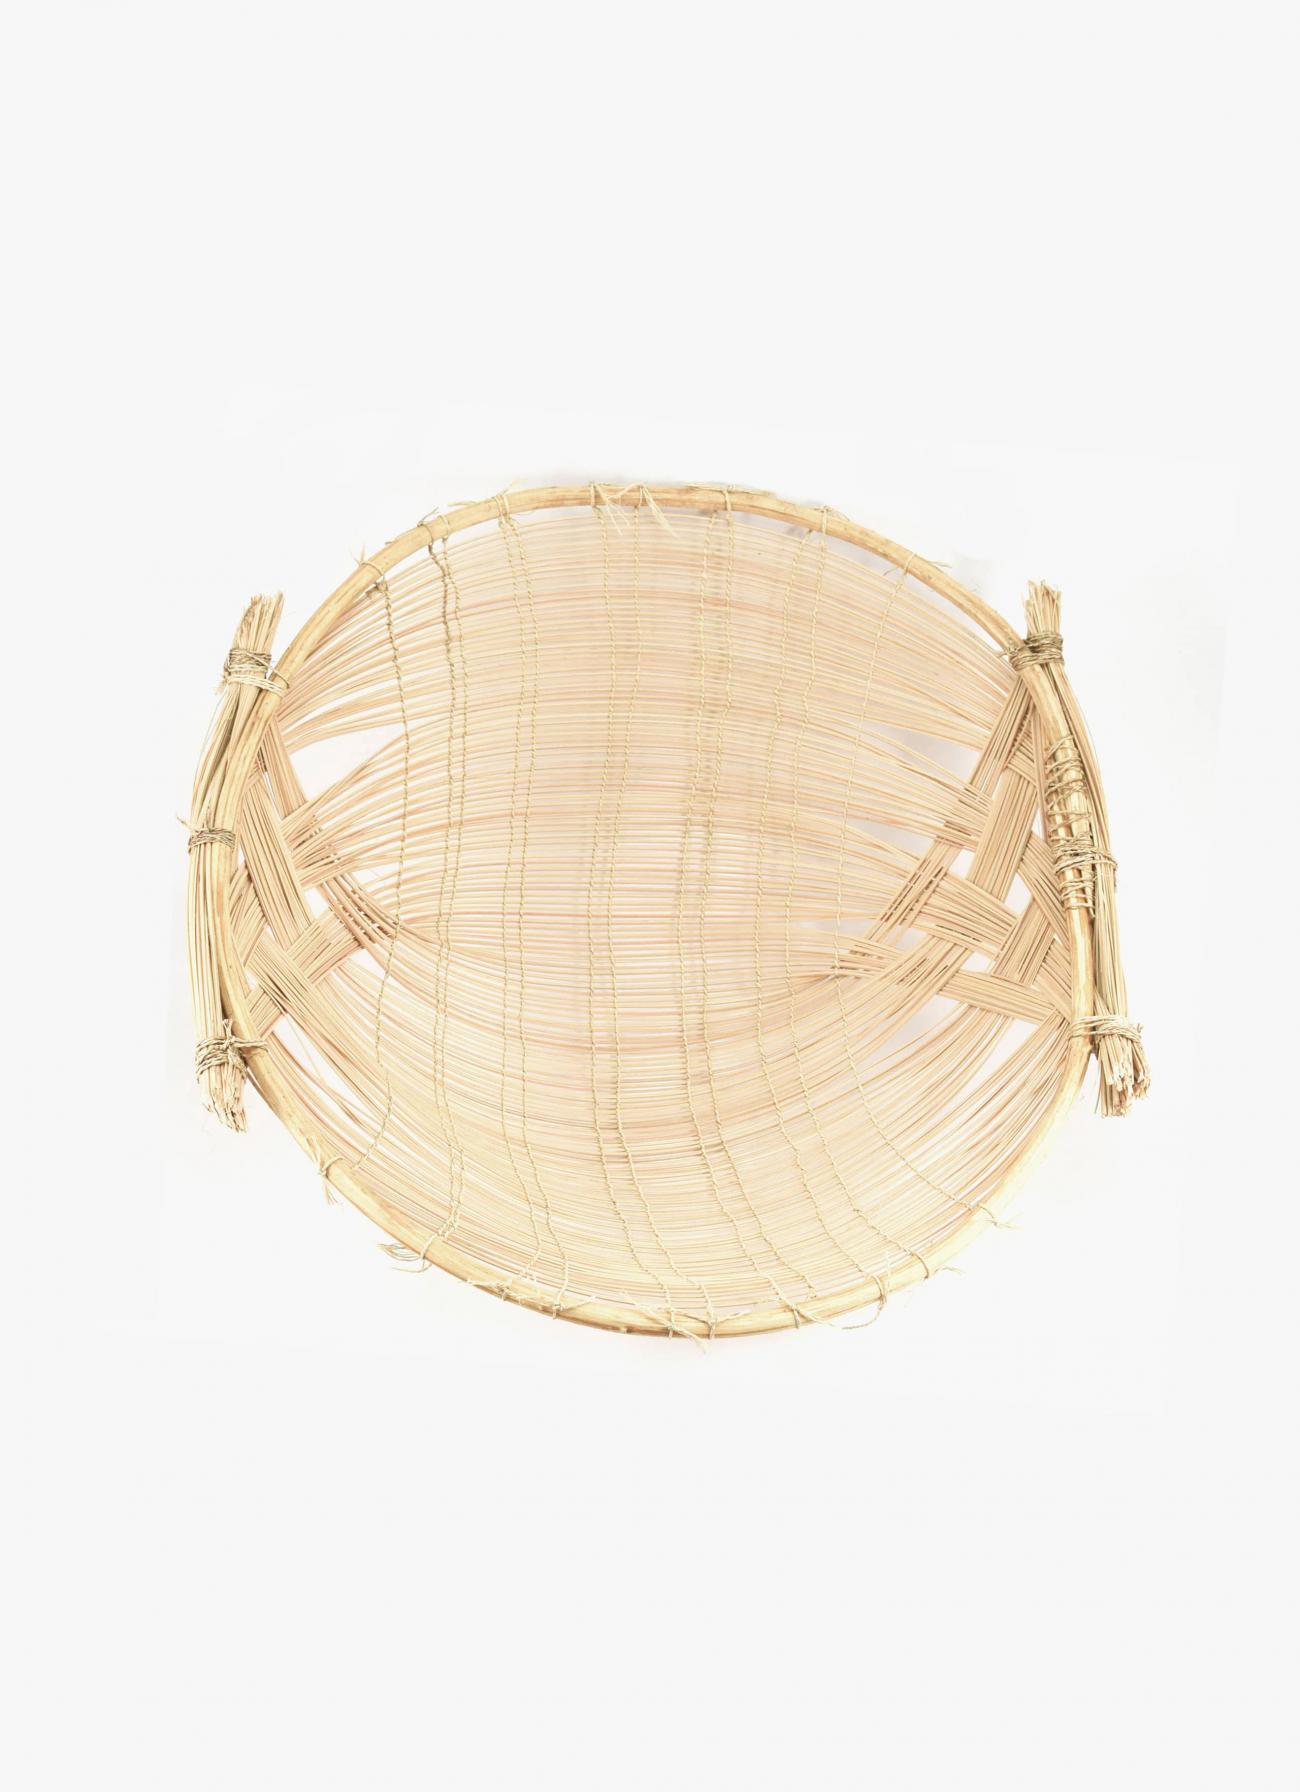 Incausa - Mehinako - Traditional Fishing Basket